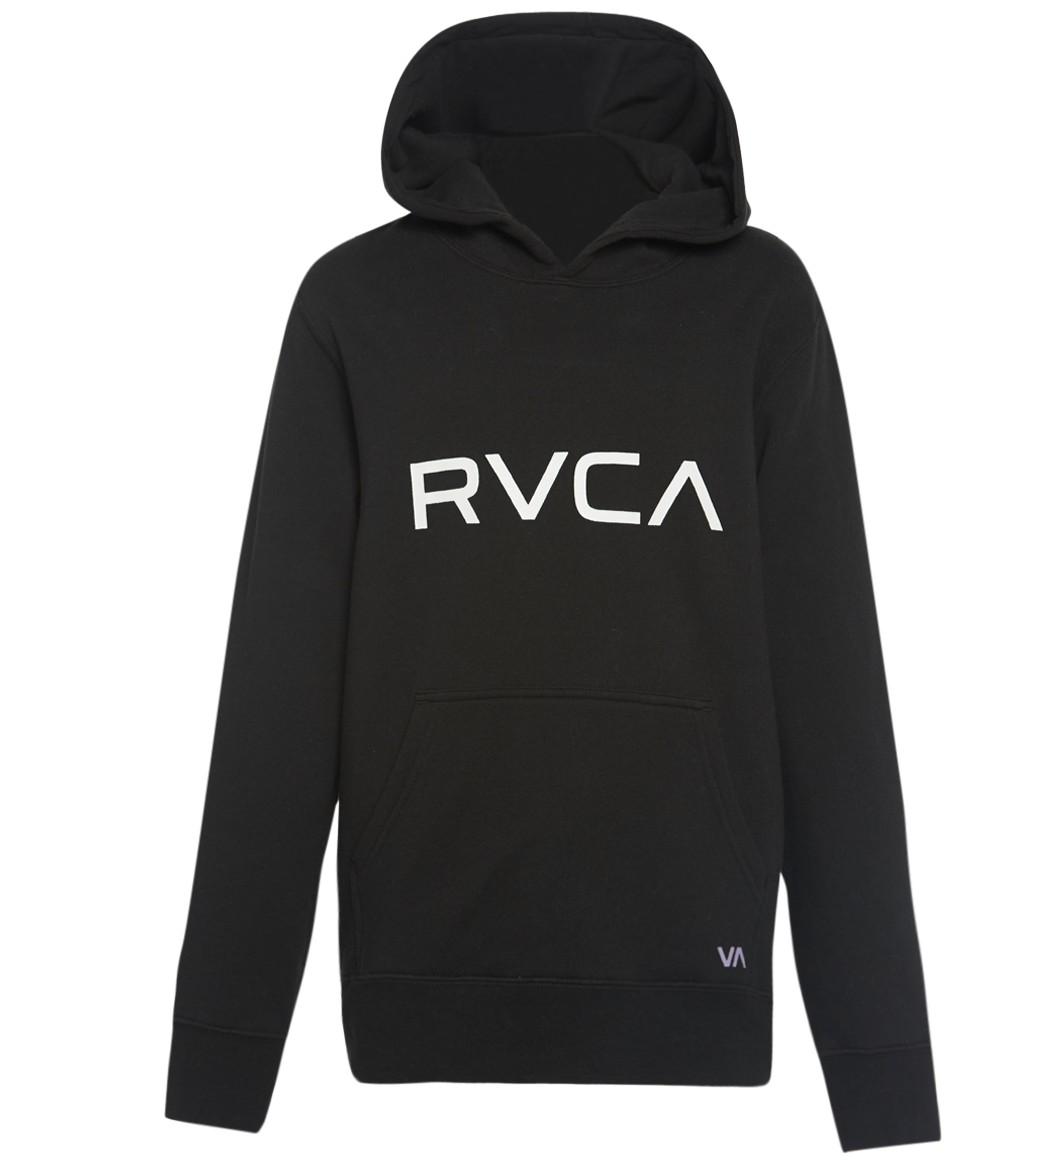 RVCA Boys Big DRIFTIN Out Pullover Hoodie